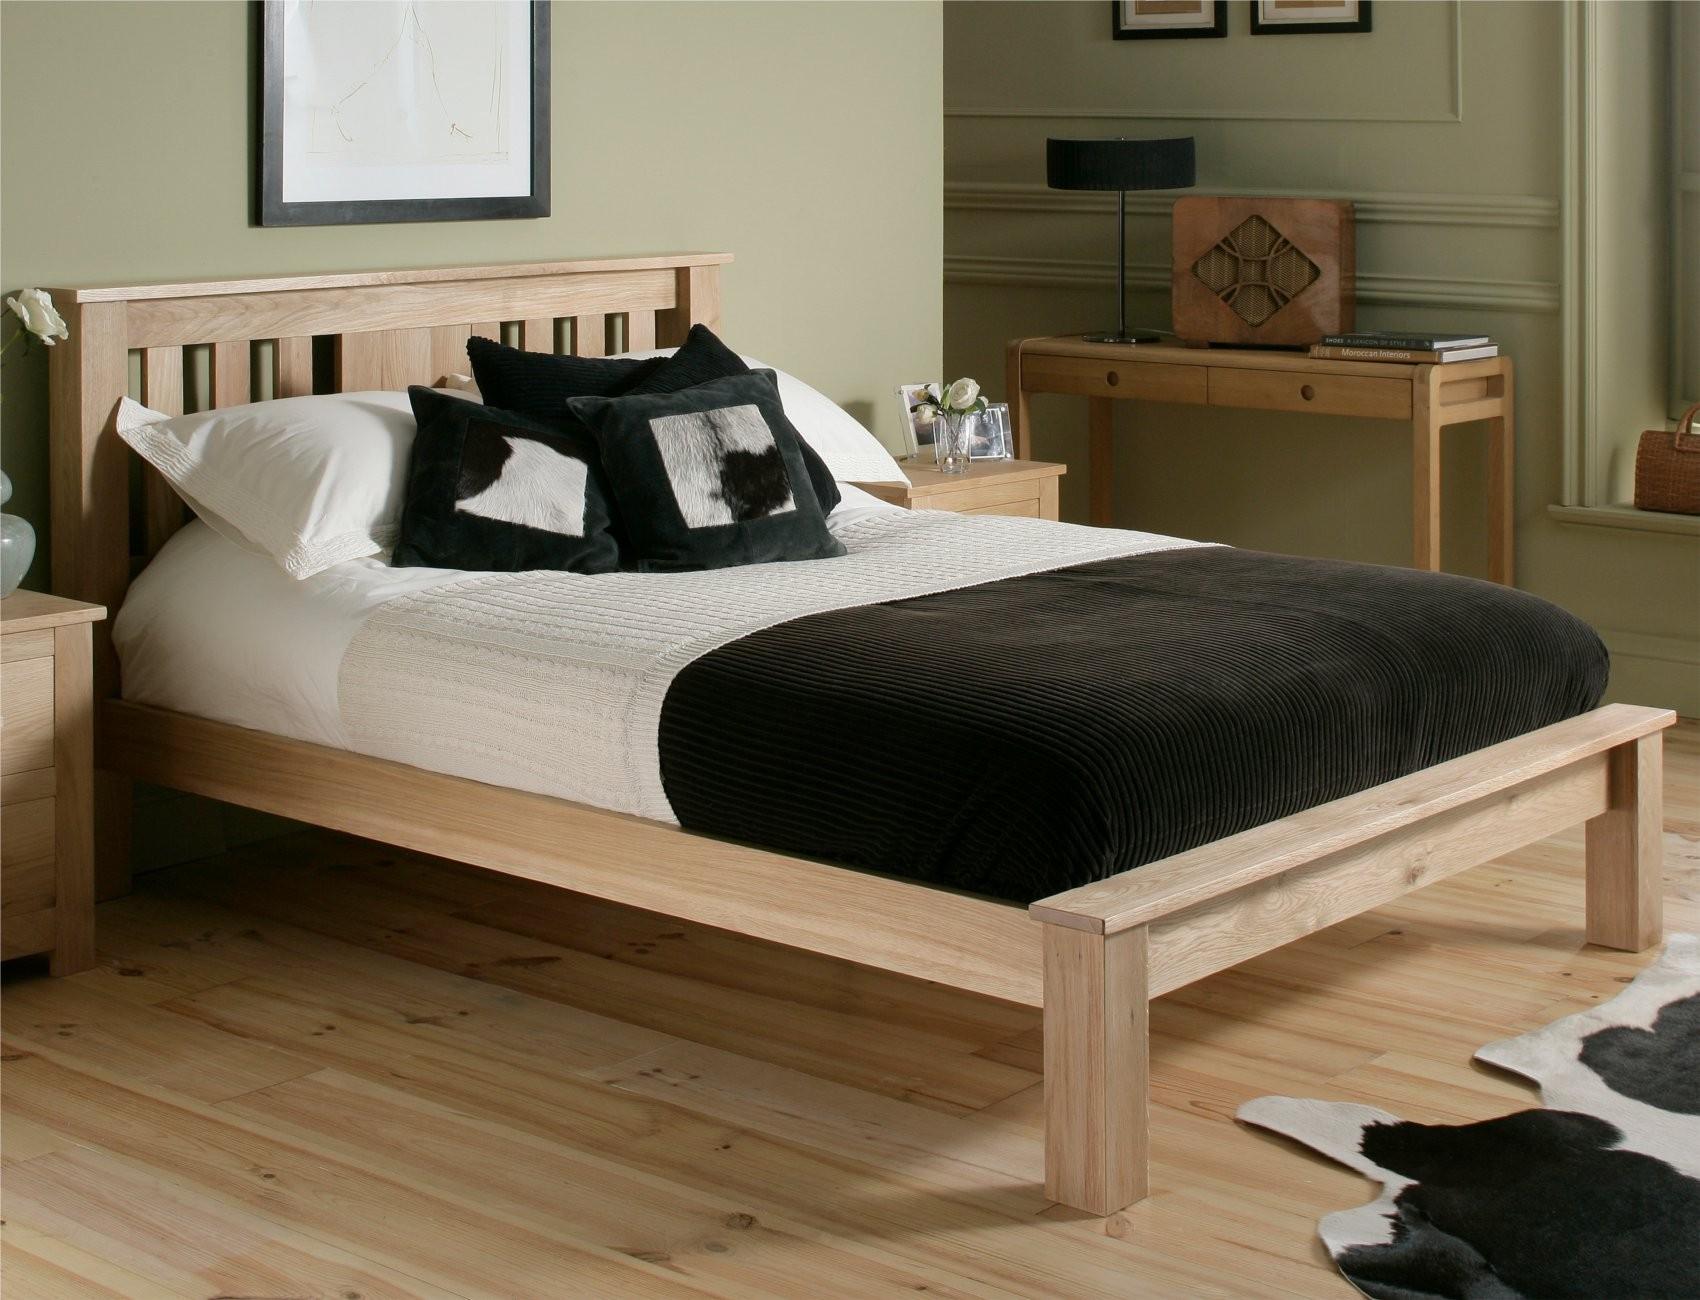 Giường đôi gỗ sồi Platform King Size 1.8